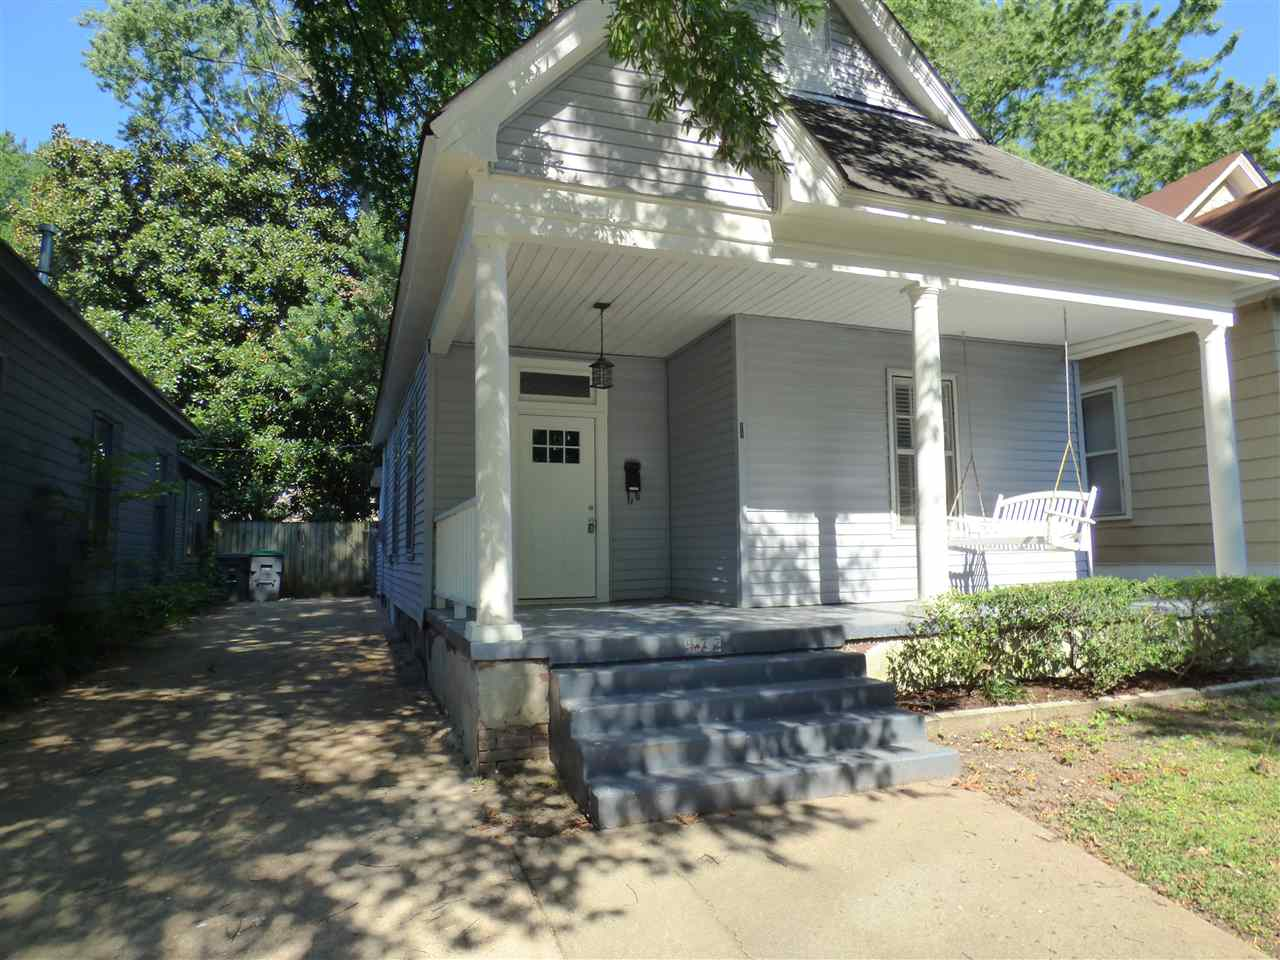 977 PHILADELPHIA RD, Memphis, TN 38104